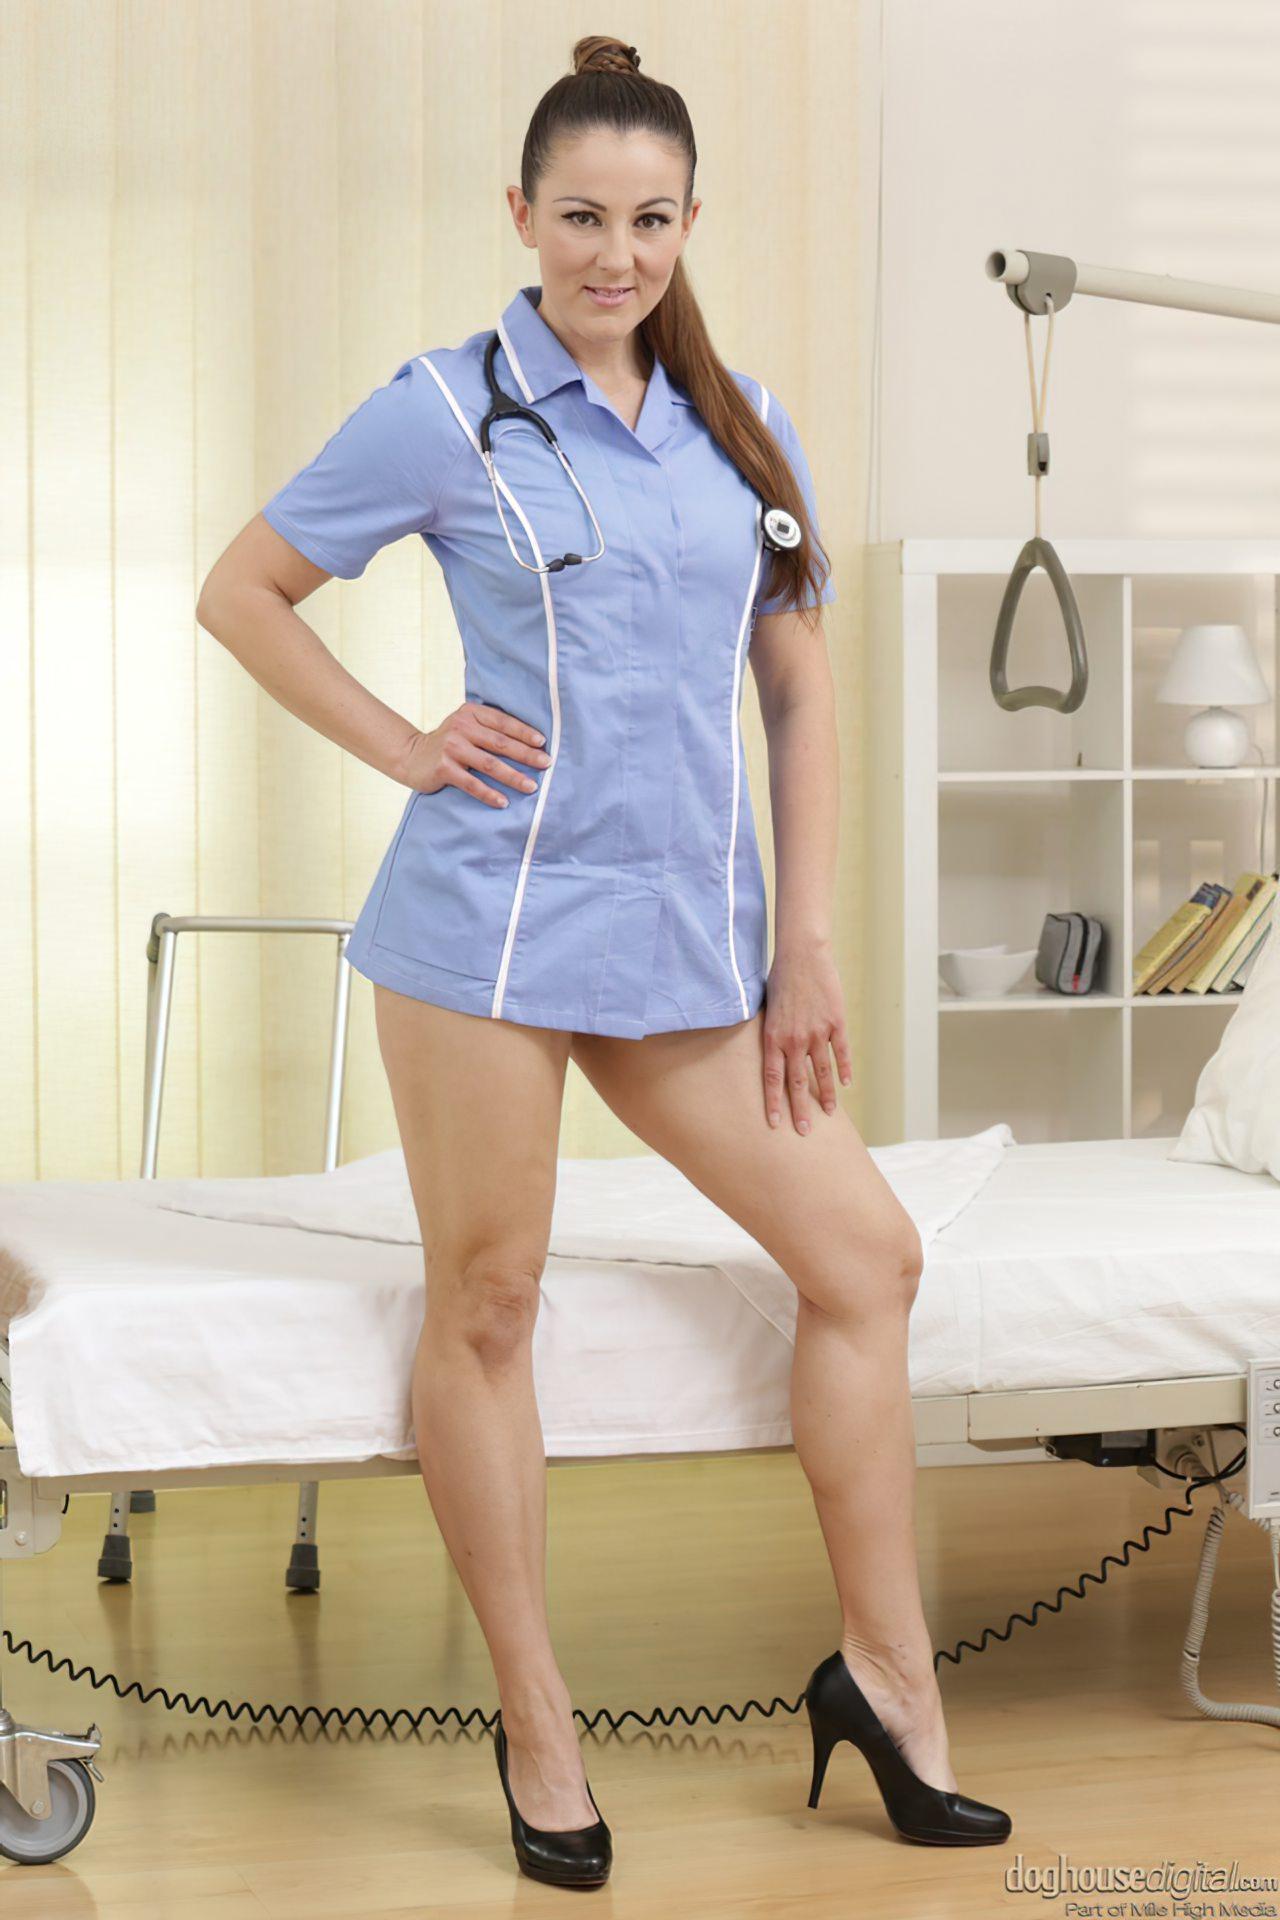 Enfermeira Peluda Tratando Paciente (1)